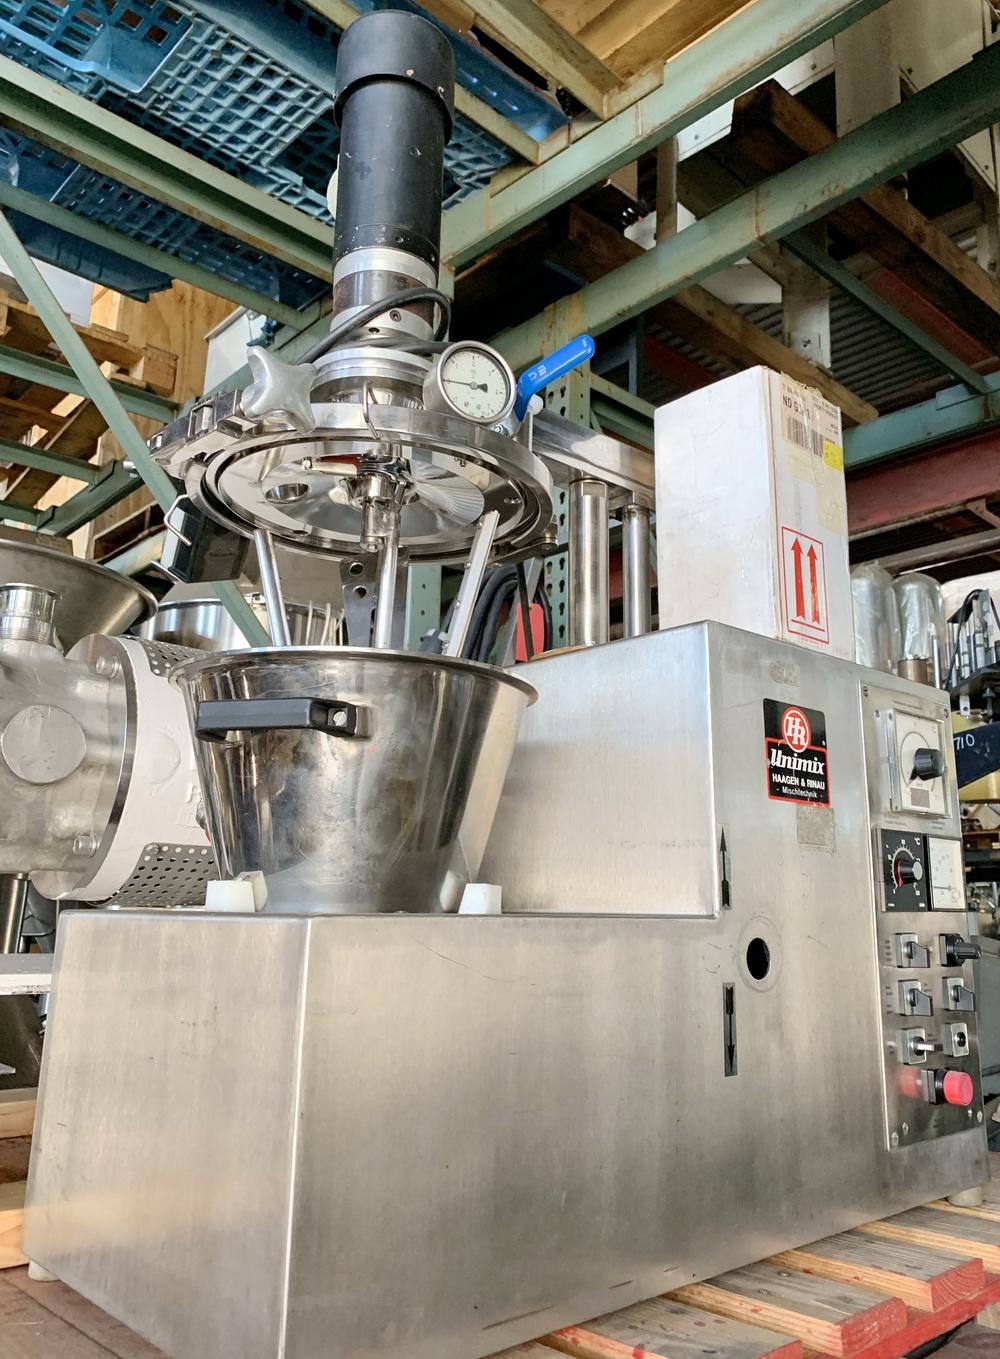 Haagen Rinau (Ekato) 1 gallon SS Vacuum/Jacketed Lab Process Mixer, Model Unimix, S/N 866-3276 - Image 7 of 10